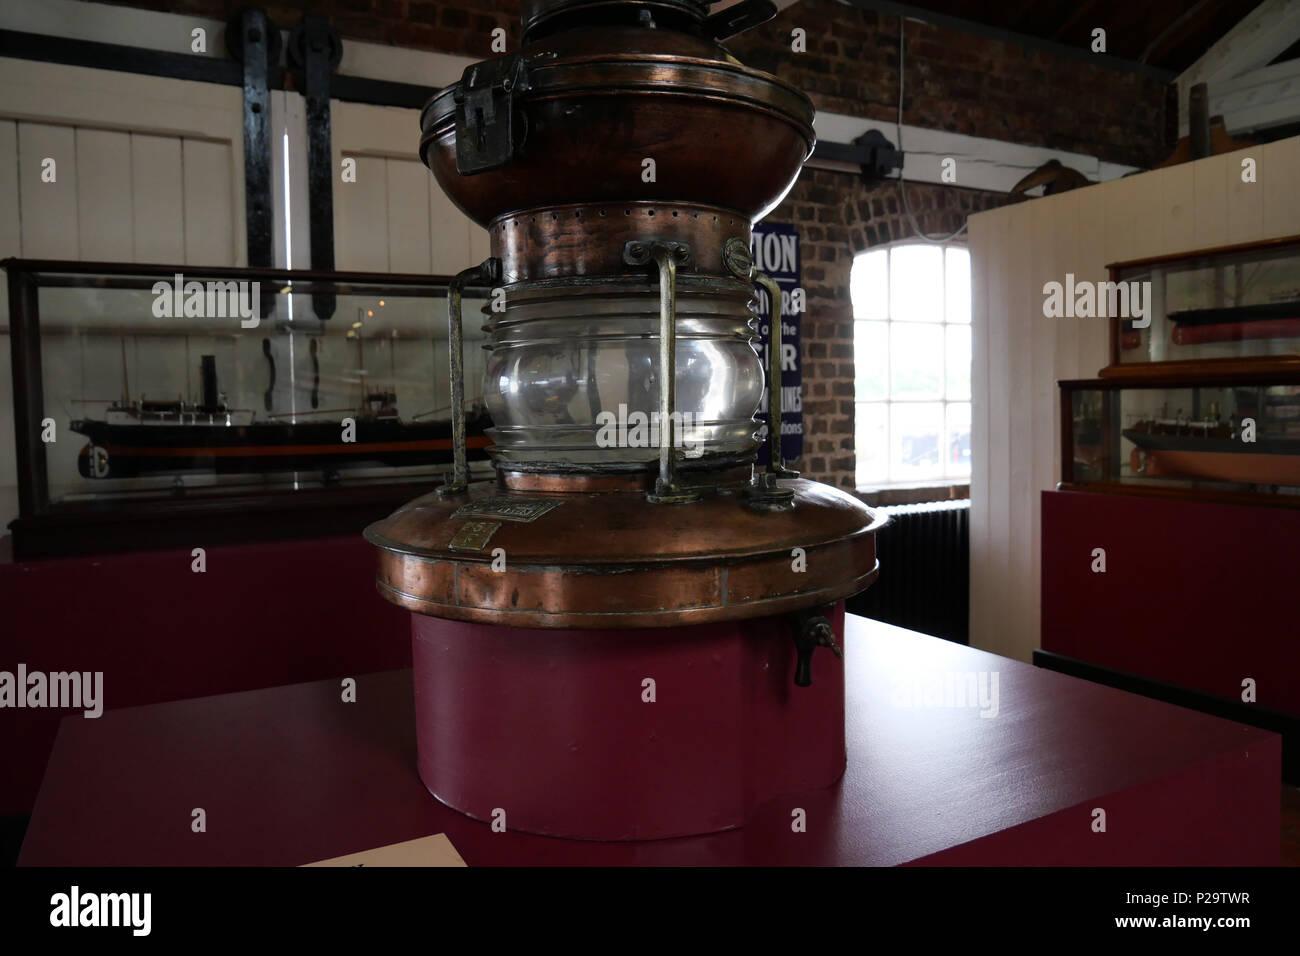 Navigation Lamp with Oil Burner. National Waterways Museum. UK. - Stock Image